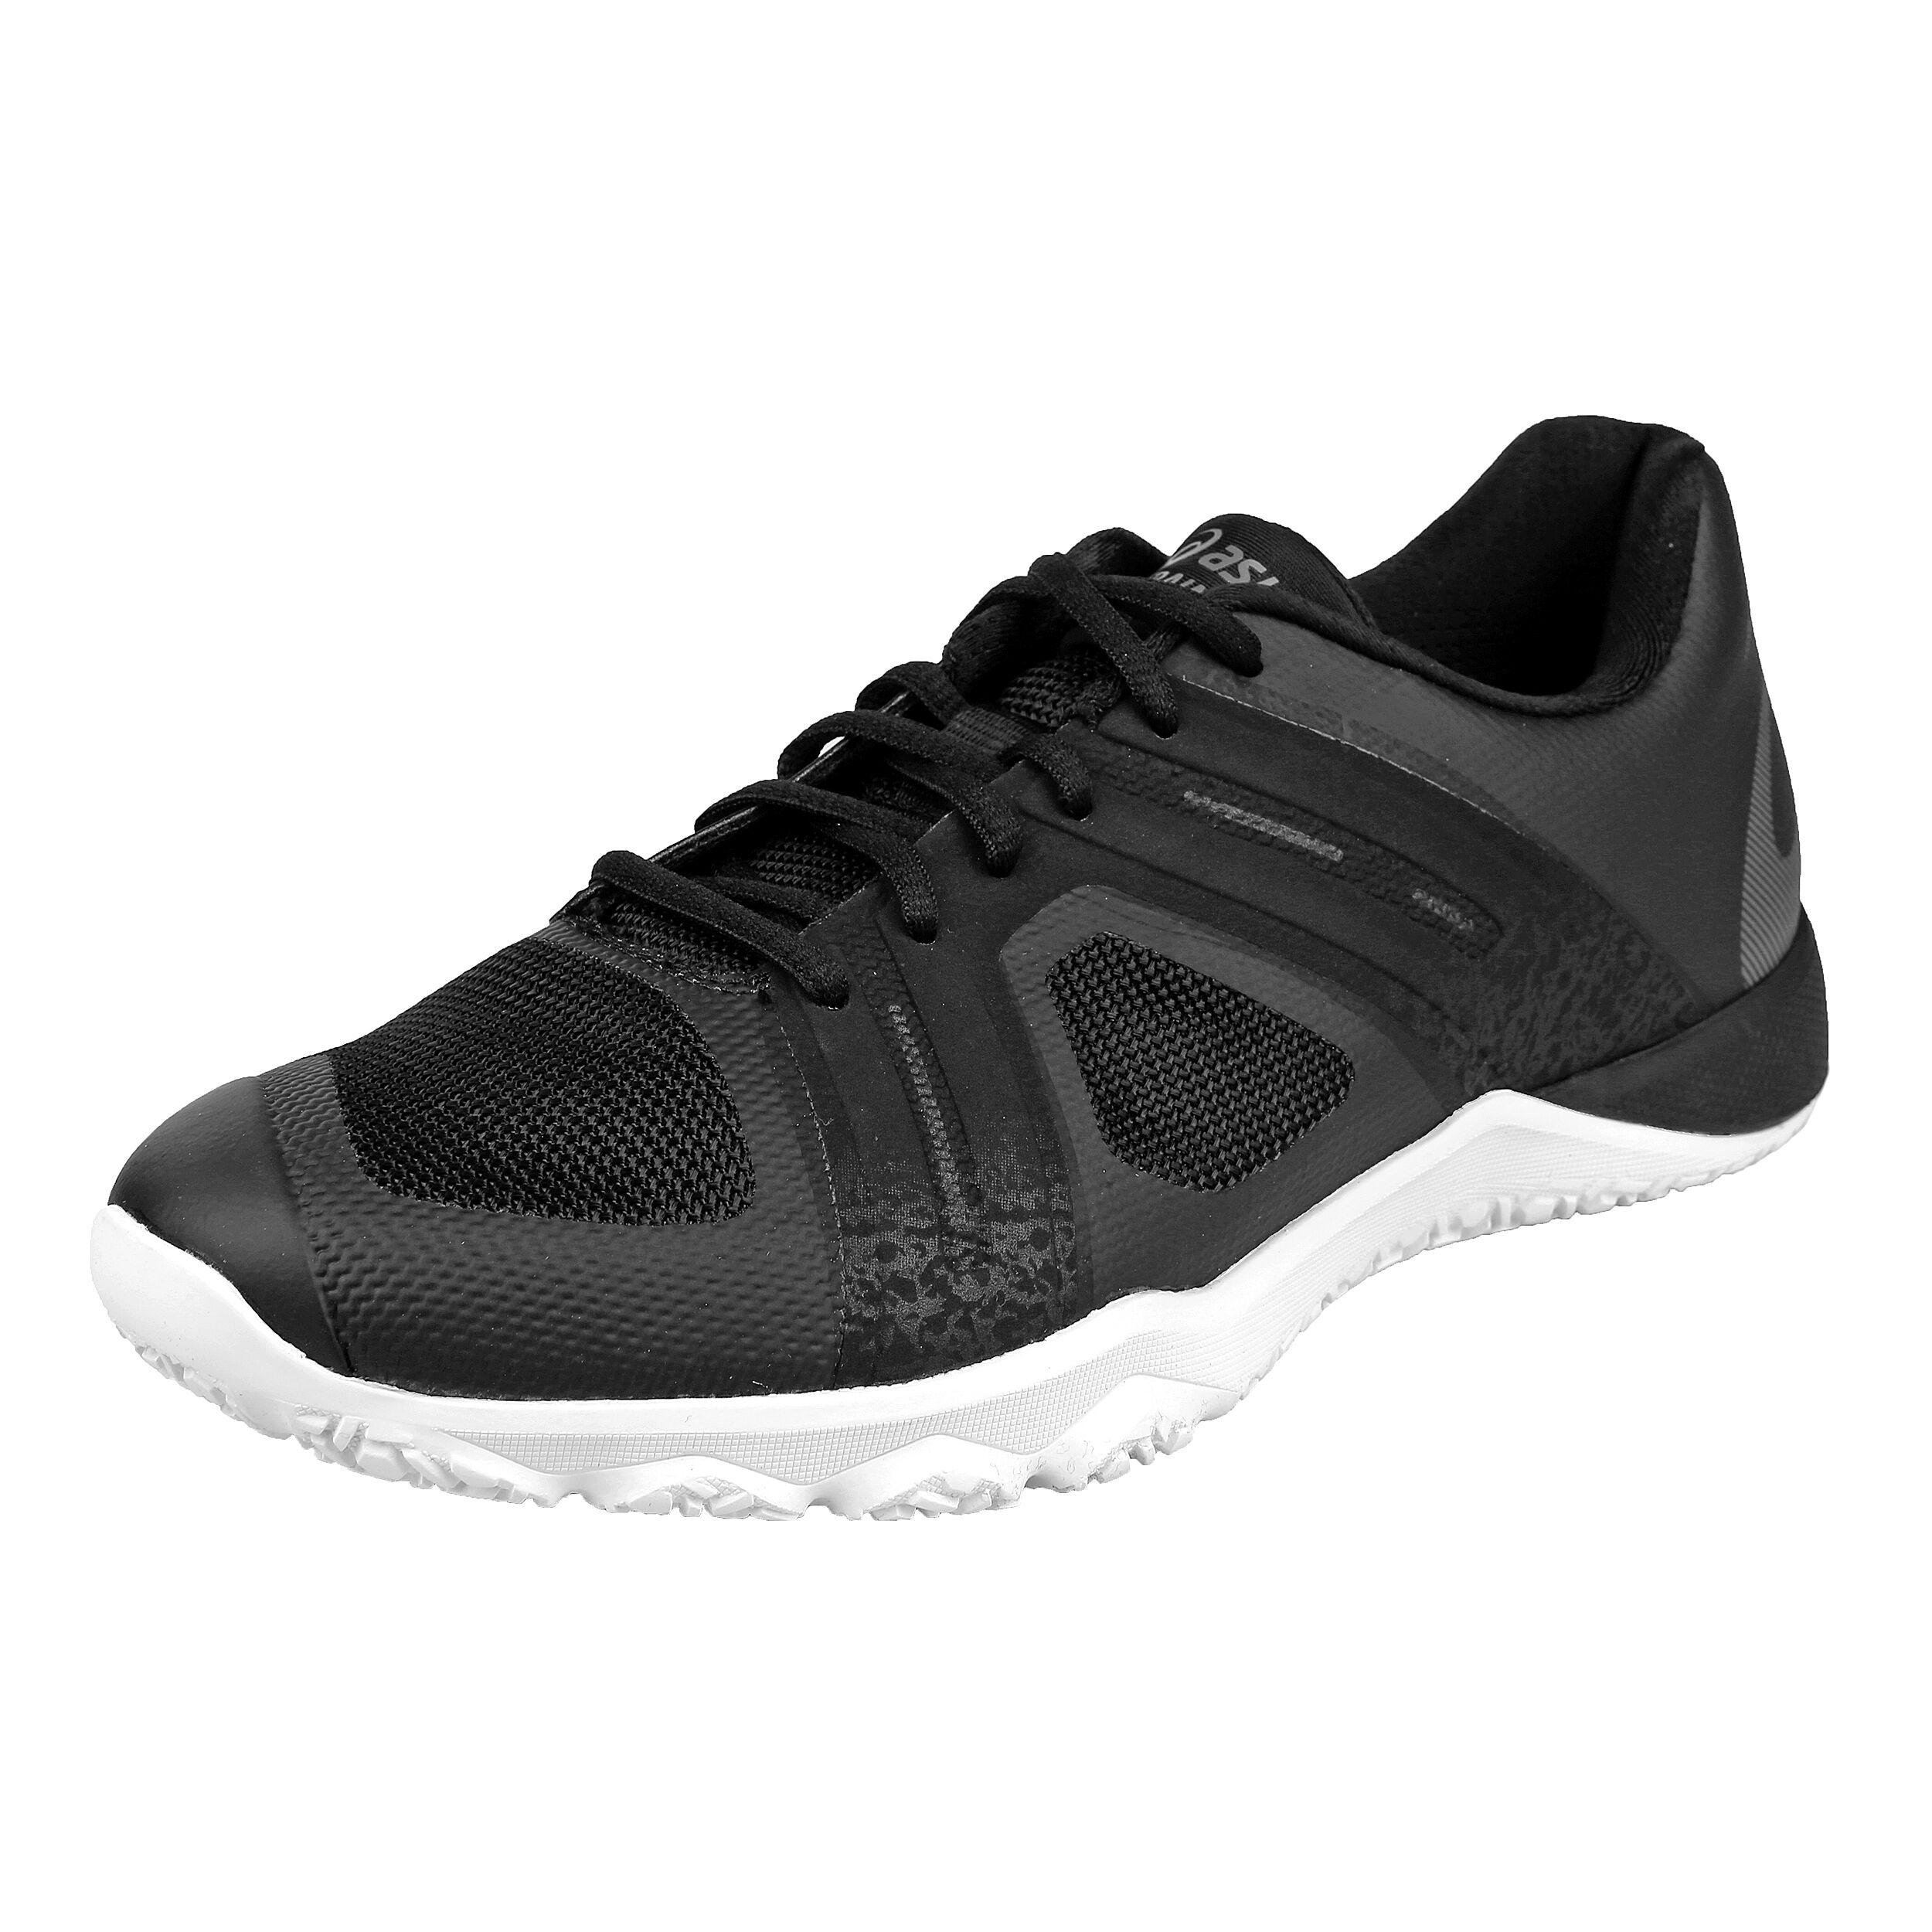 Asics Conviction X 2 Fitness Shoe Women Black, Dark Grey